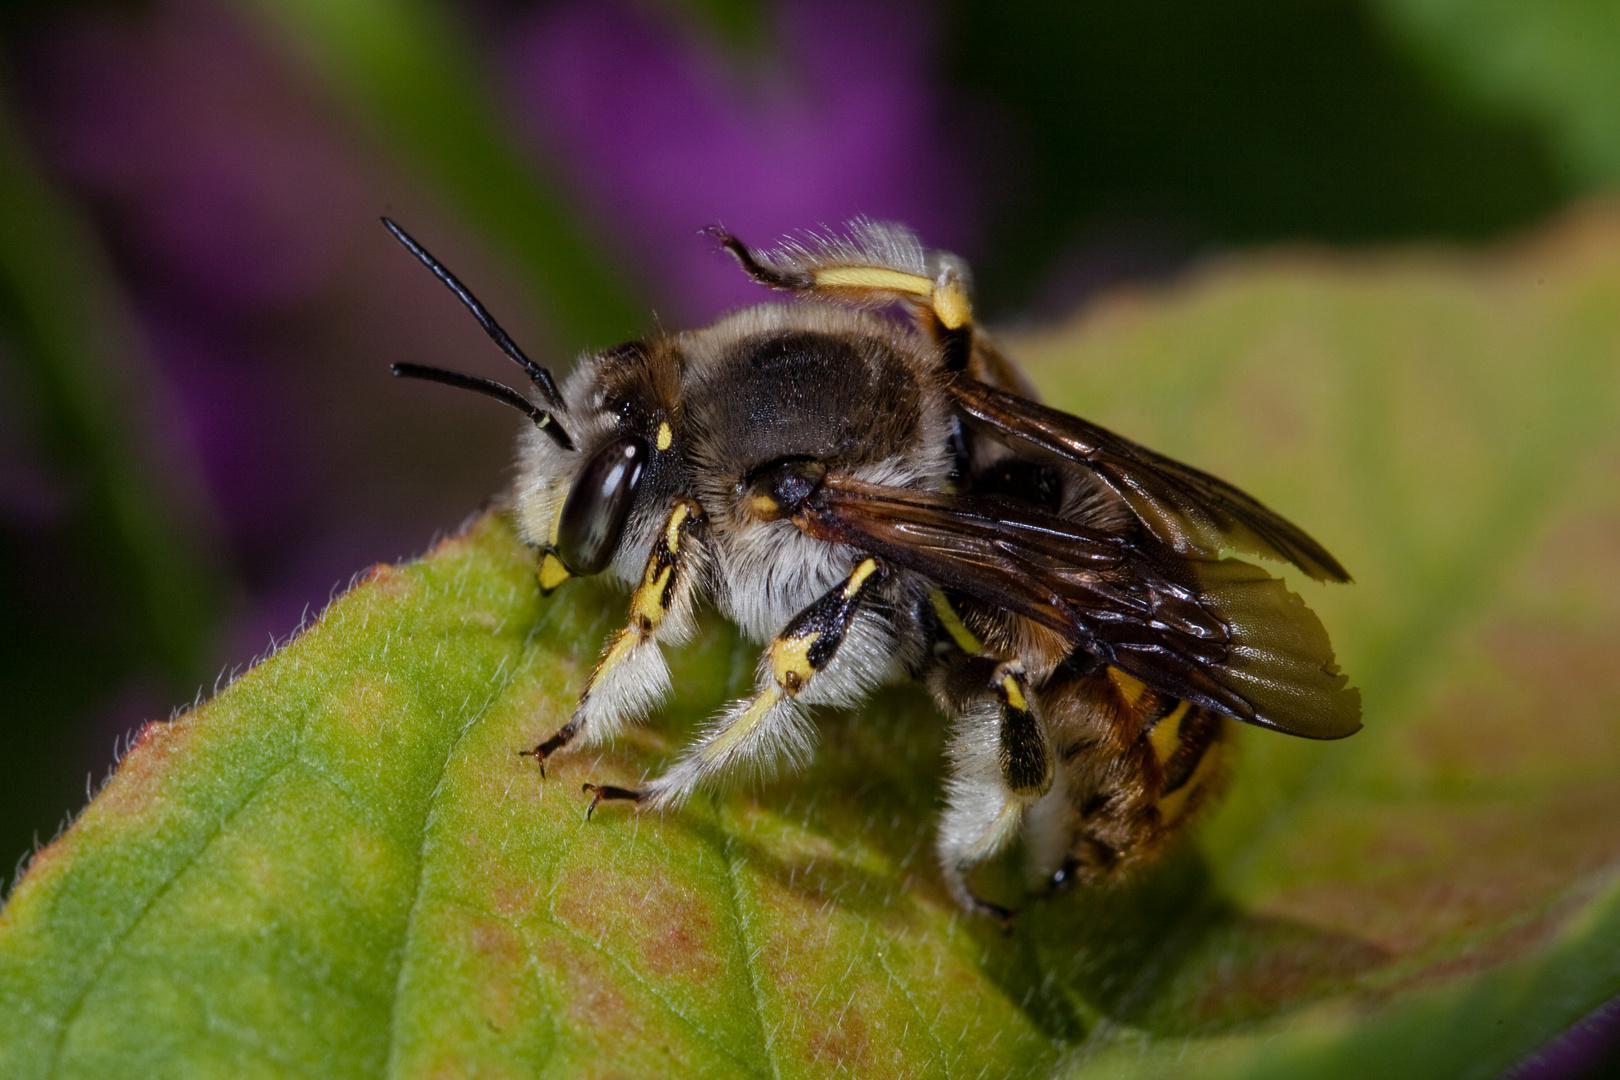 Wollige Harzbiene (Anthidium manicatum)